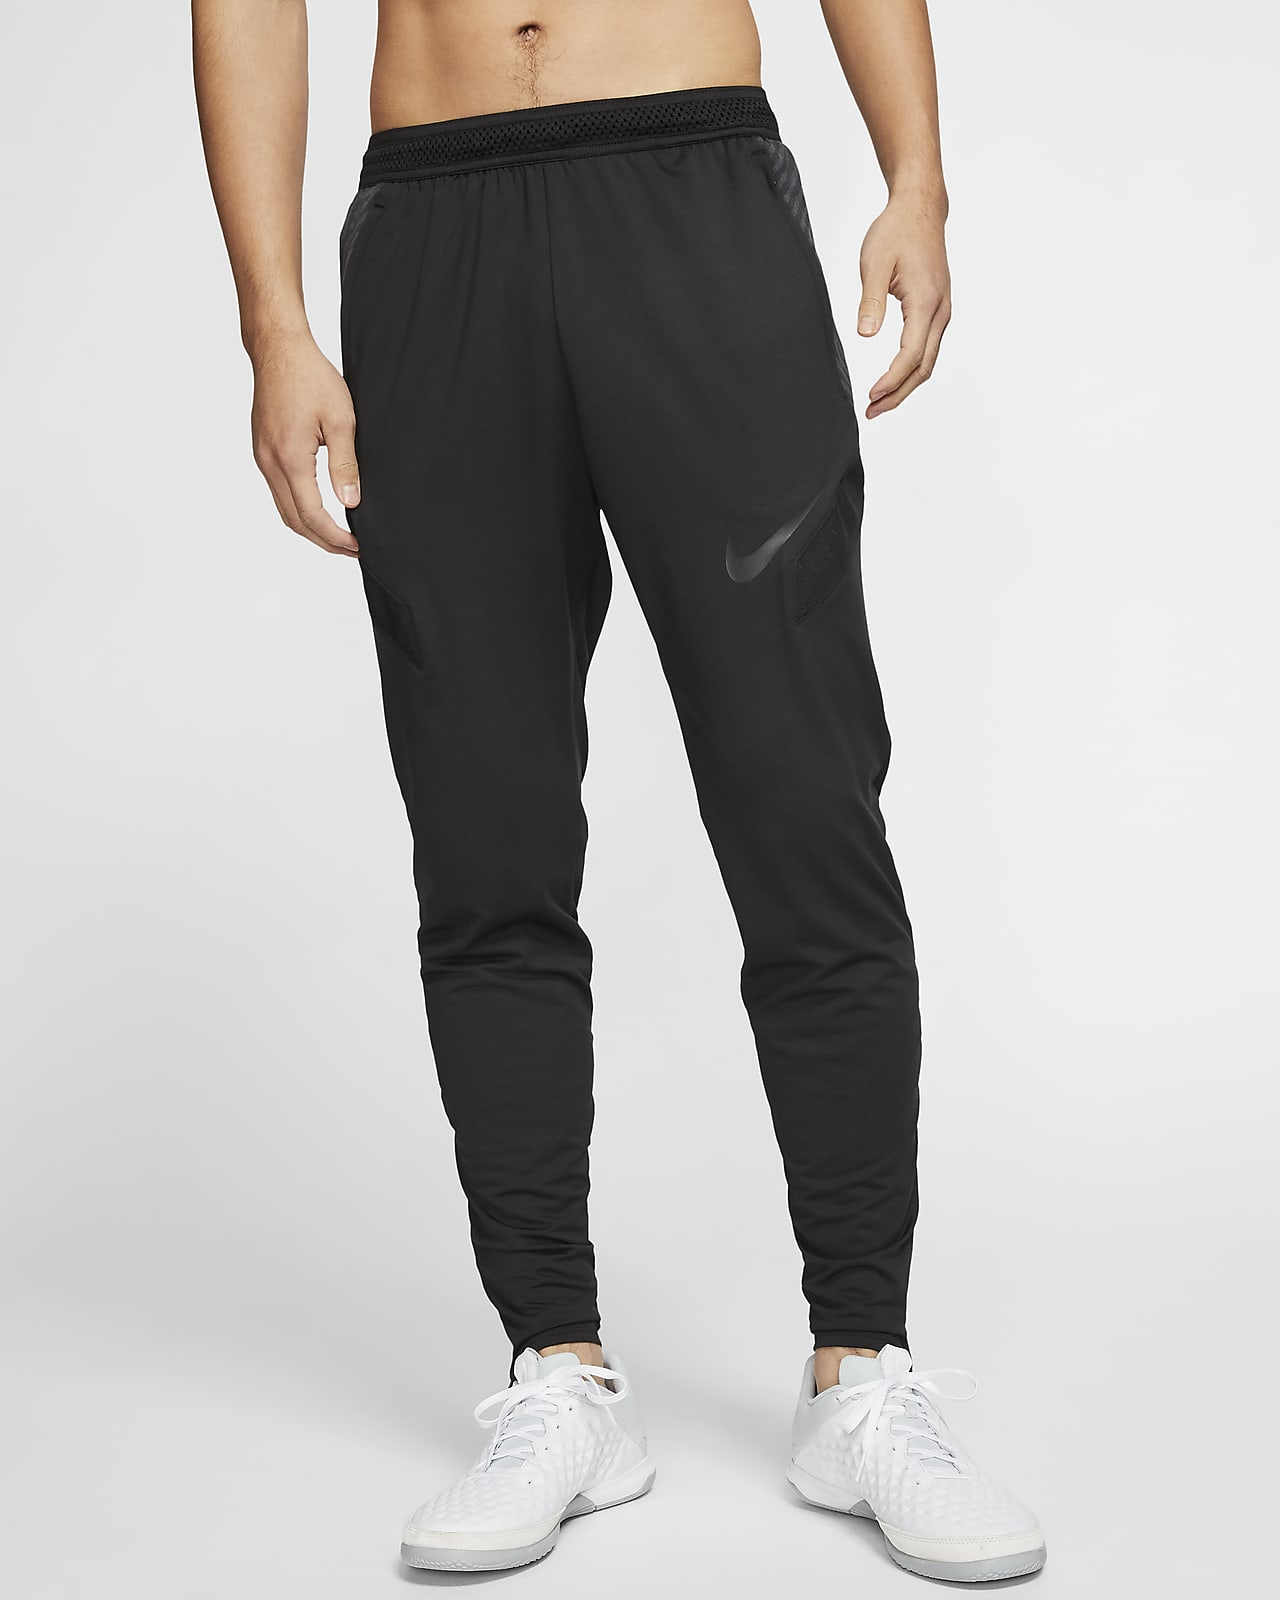 A nueve Discriminatorio tapa  Pantaloni da calcio Nike Dri-FIT Strike - Uomo. Nike IT